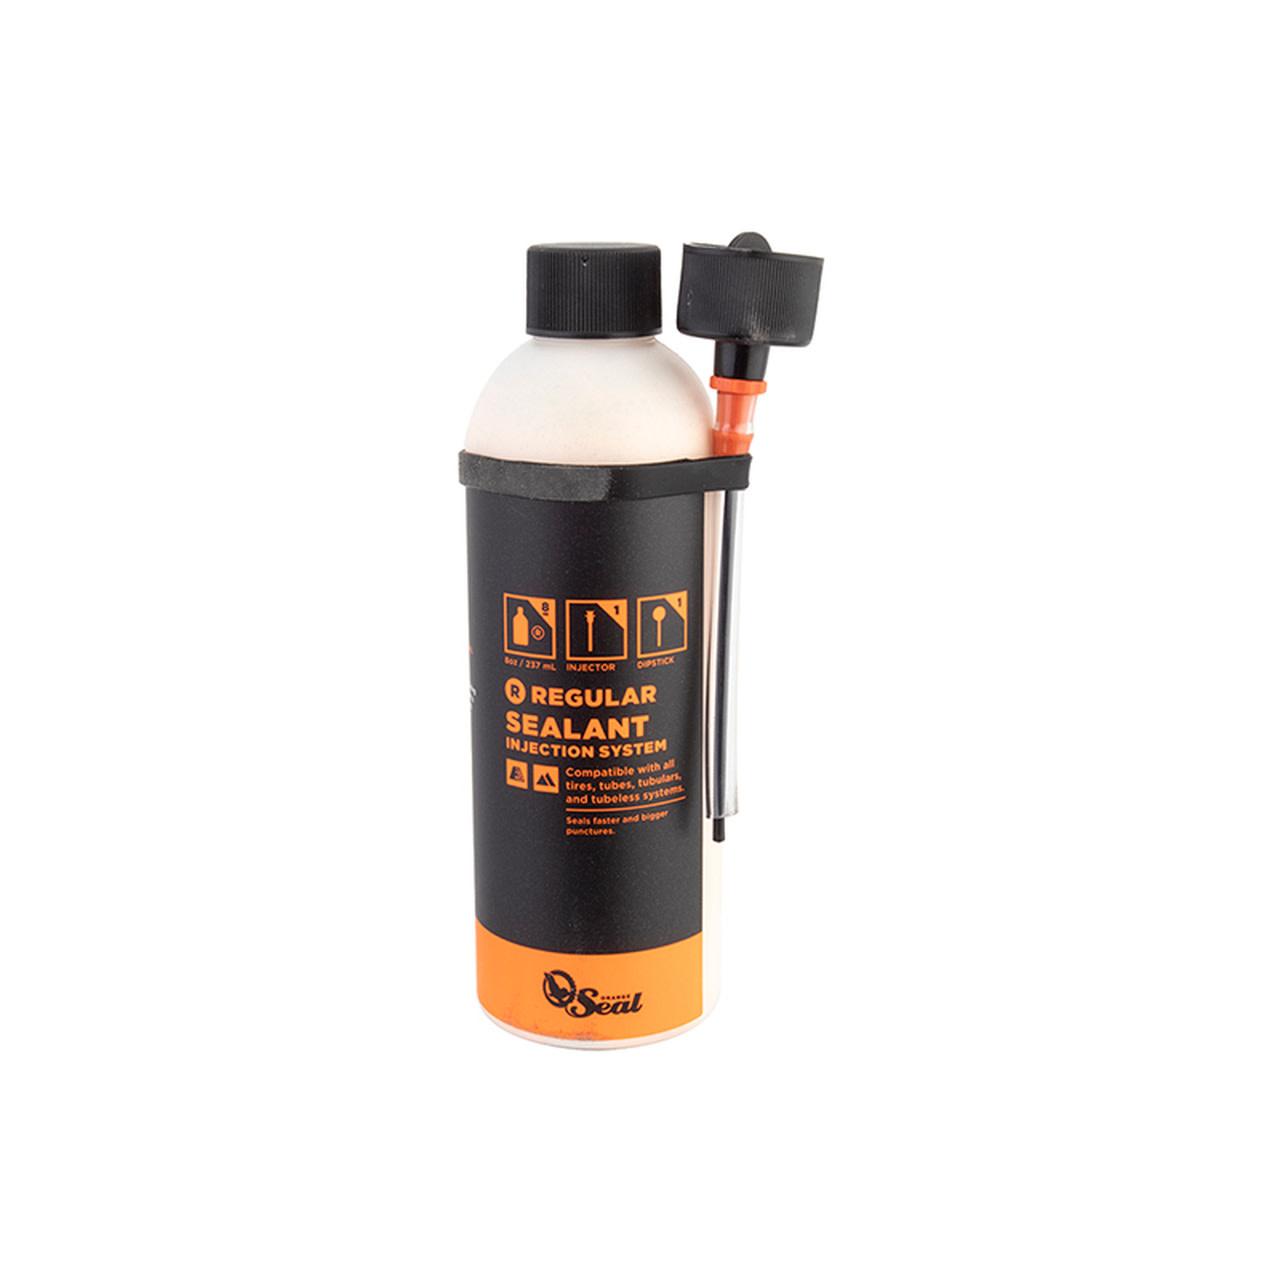 Orange Seal Orange Seal Tubeless Tire Sealant with Twist Lock Applicator - 8oz